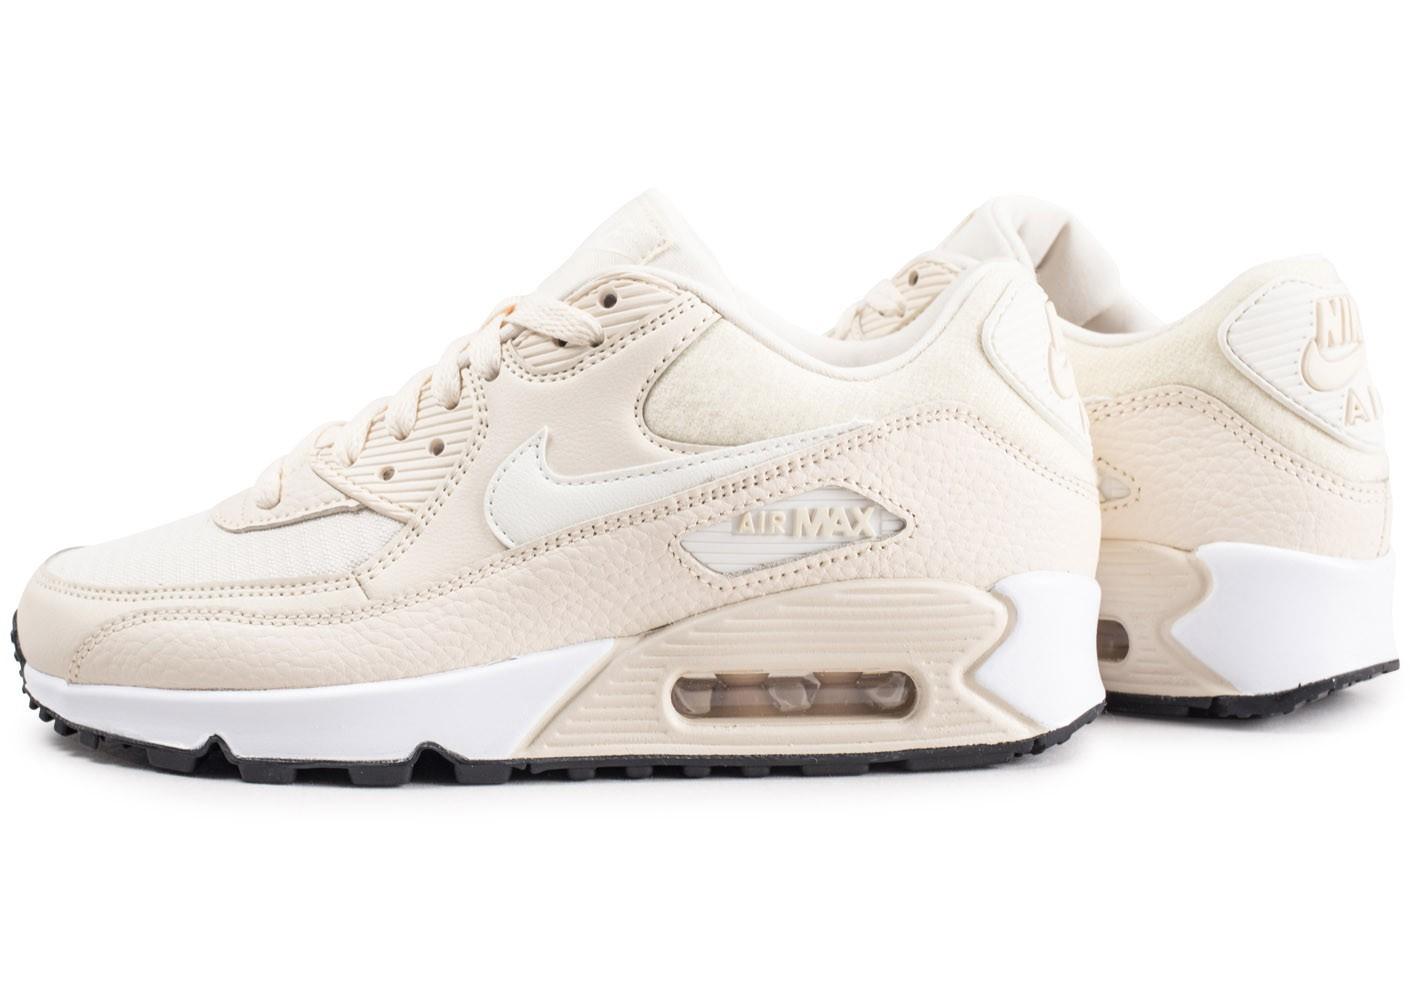 Nike Air Max 90 Premium beige Chaussures Baskets femme